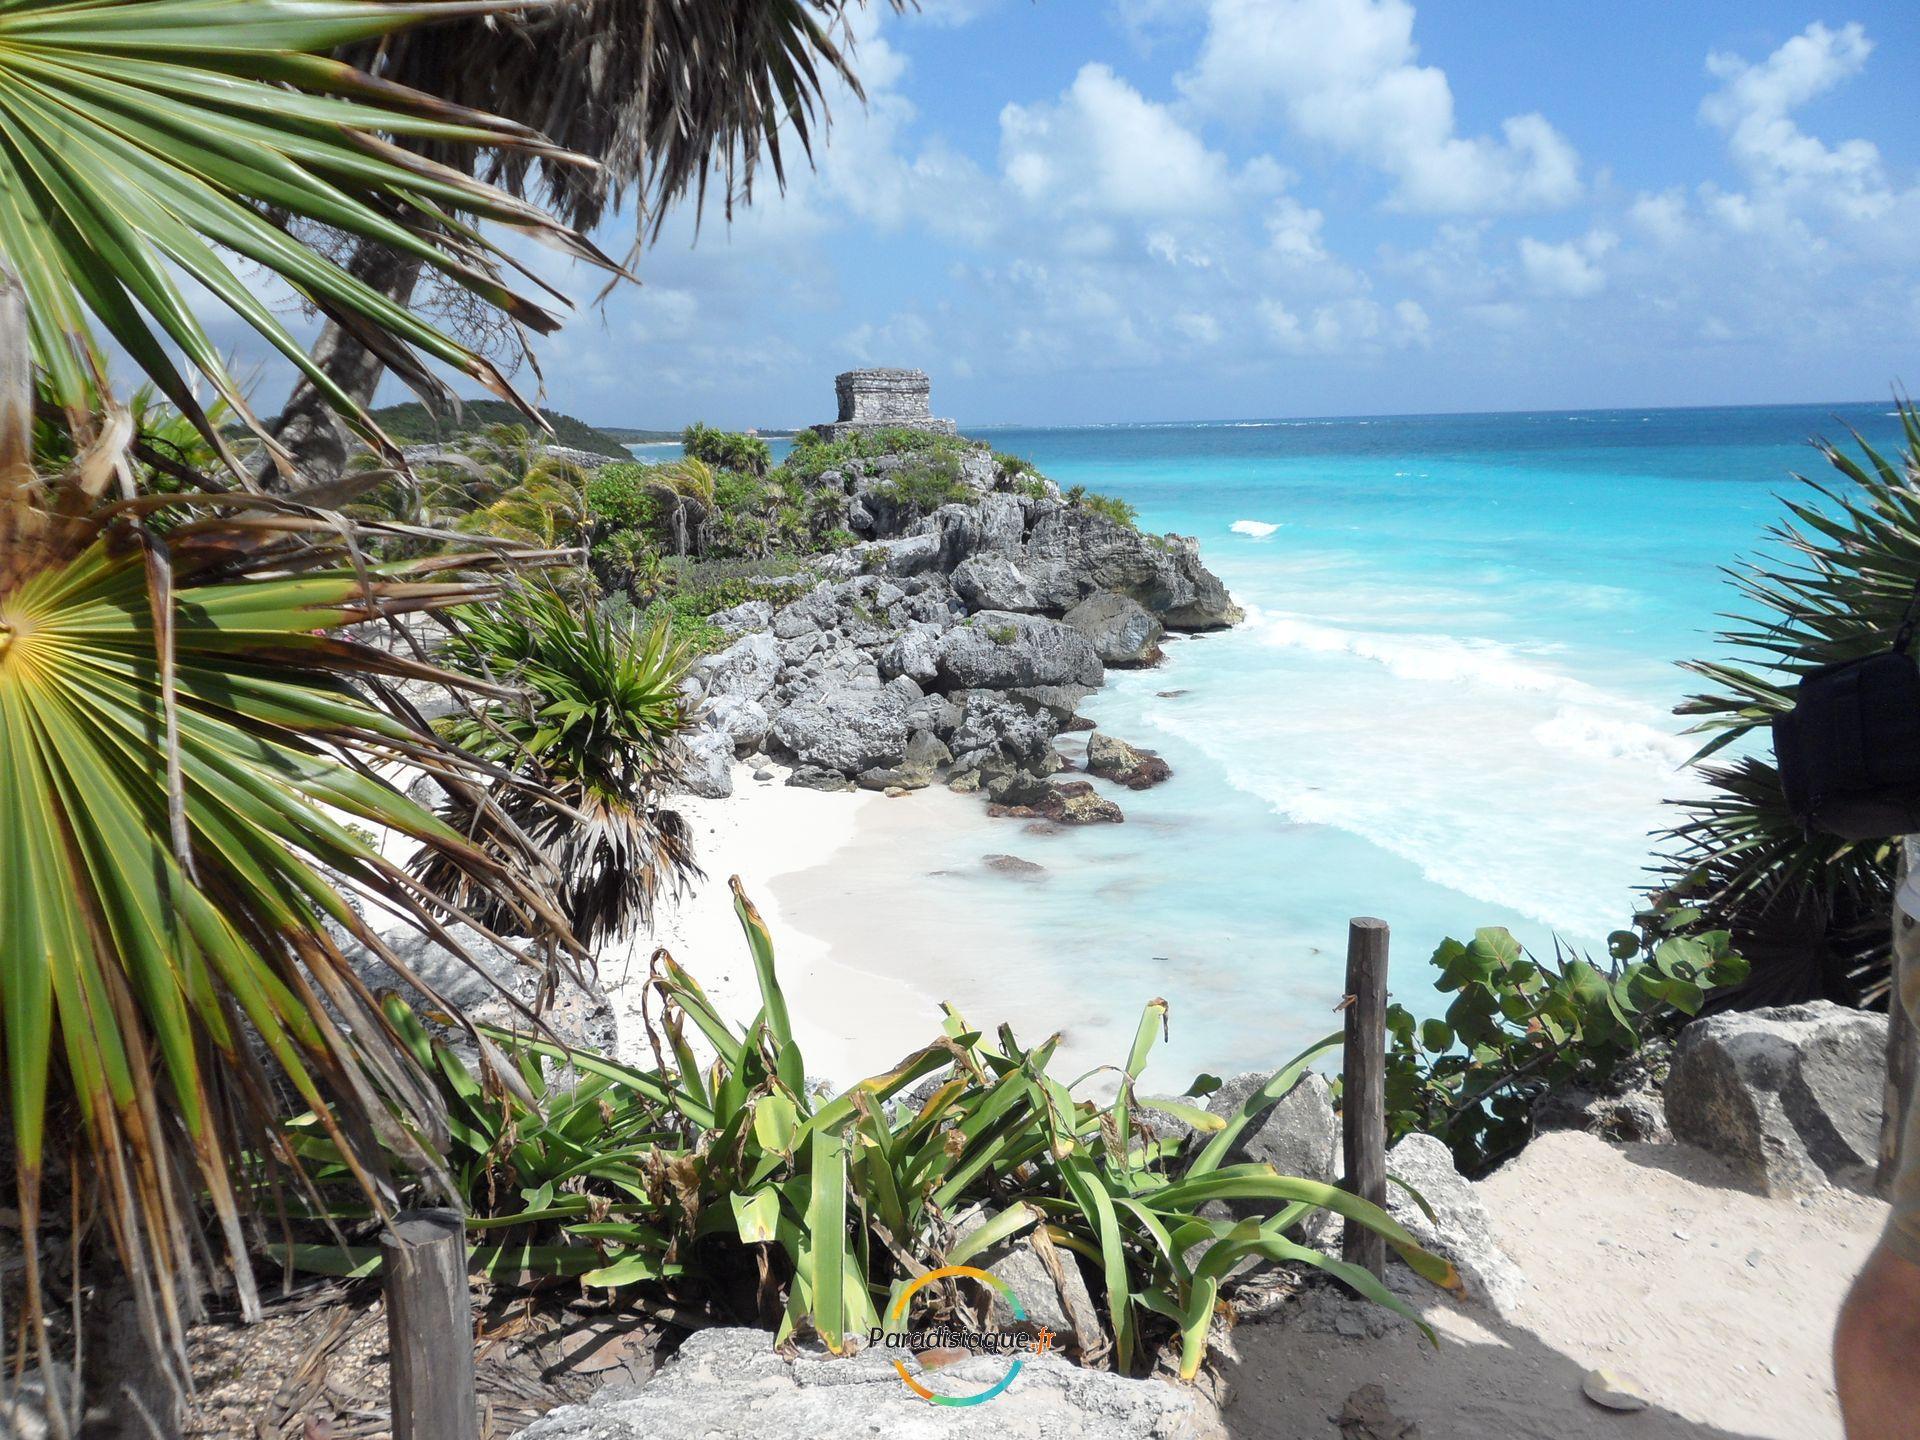 Voyage Riviera maya : Playa del Carmen, Cancun et Tulum